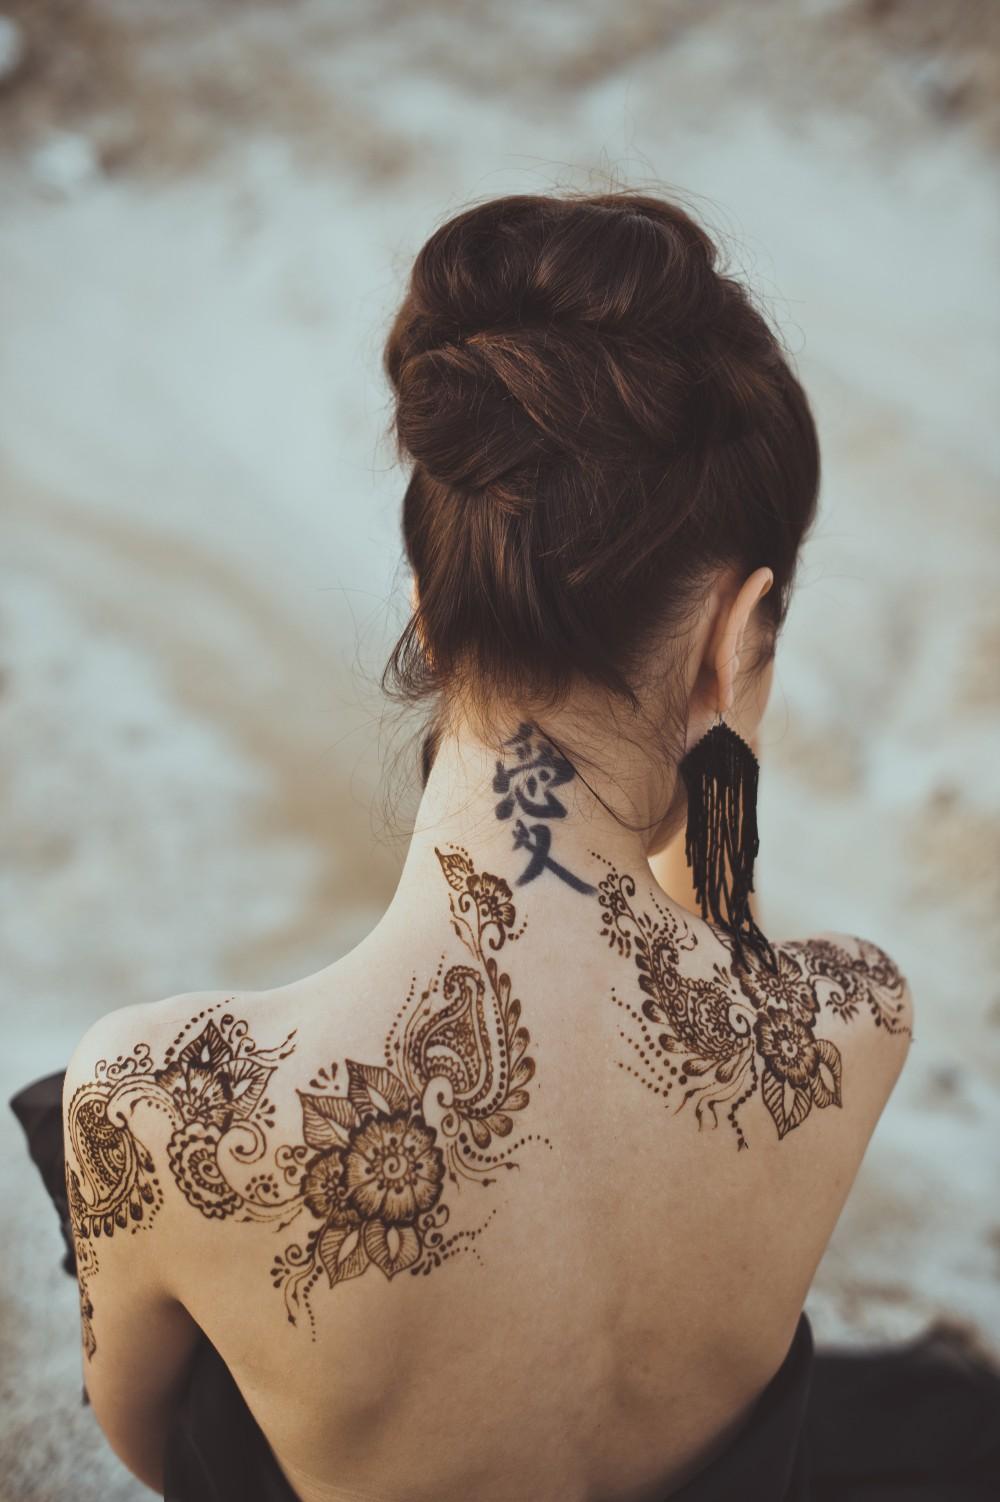 A Beautiful Tattoo ~ Barbara Musser, Sexy After Cancer